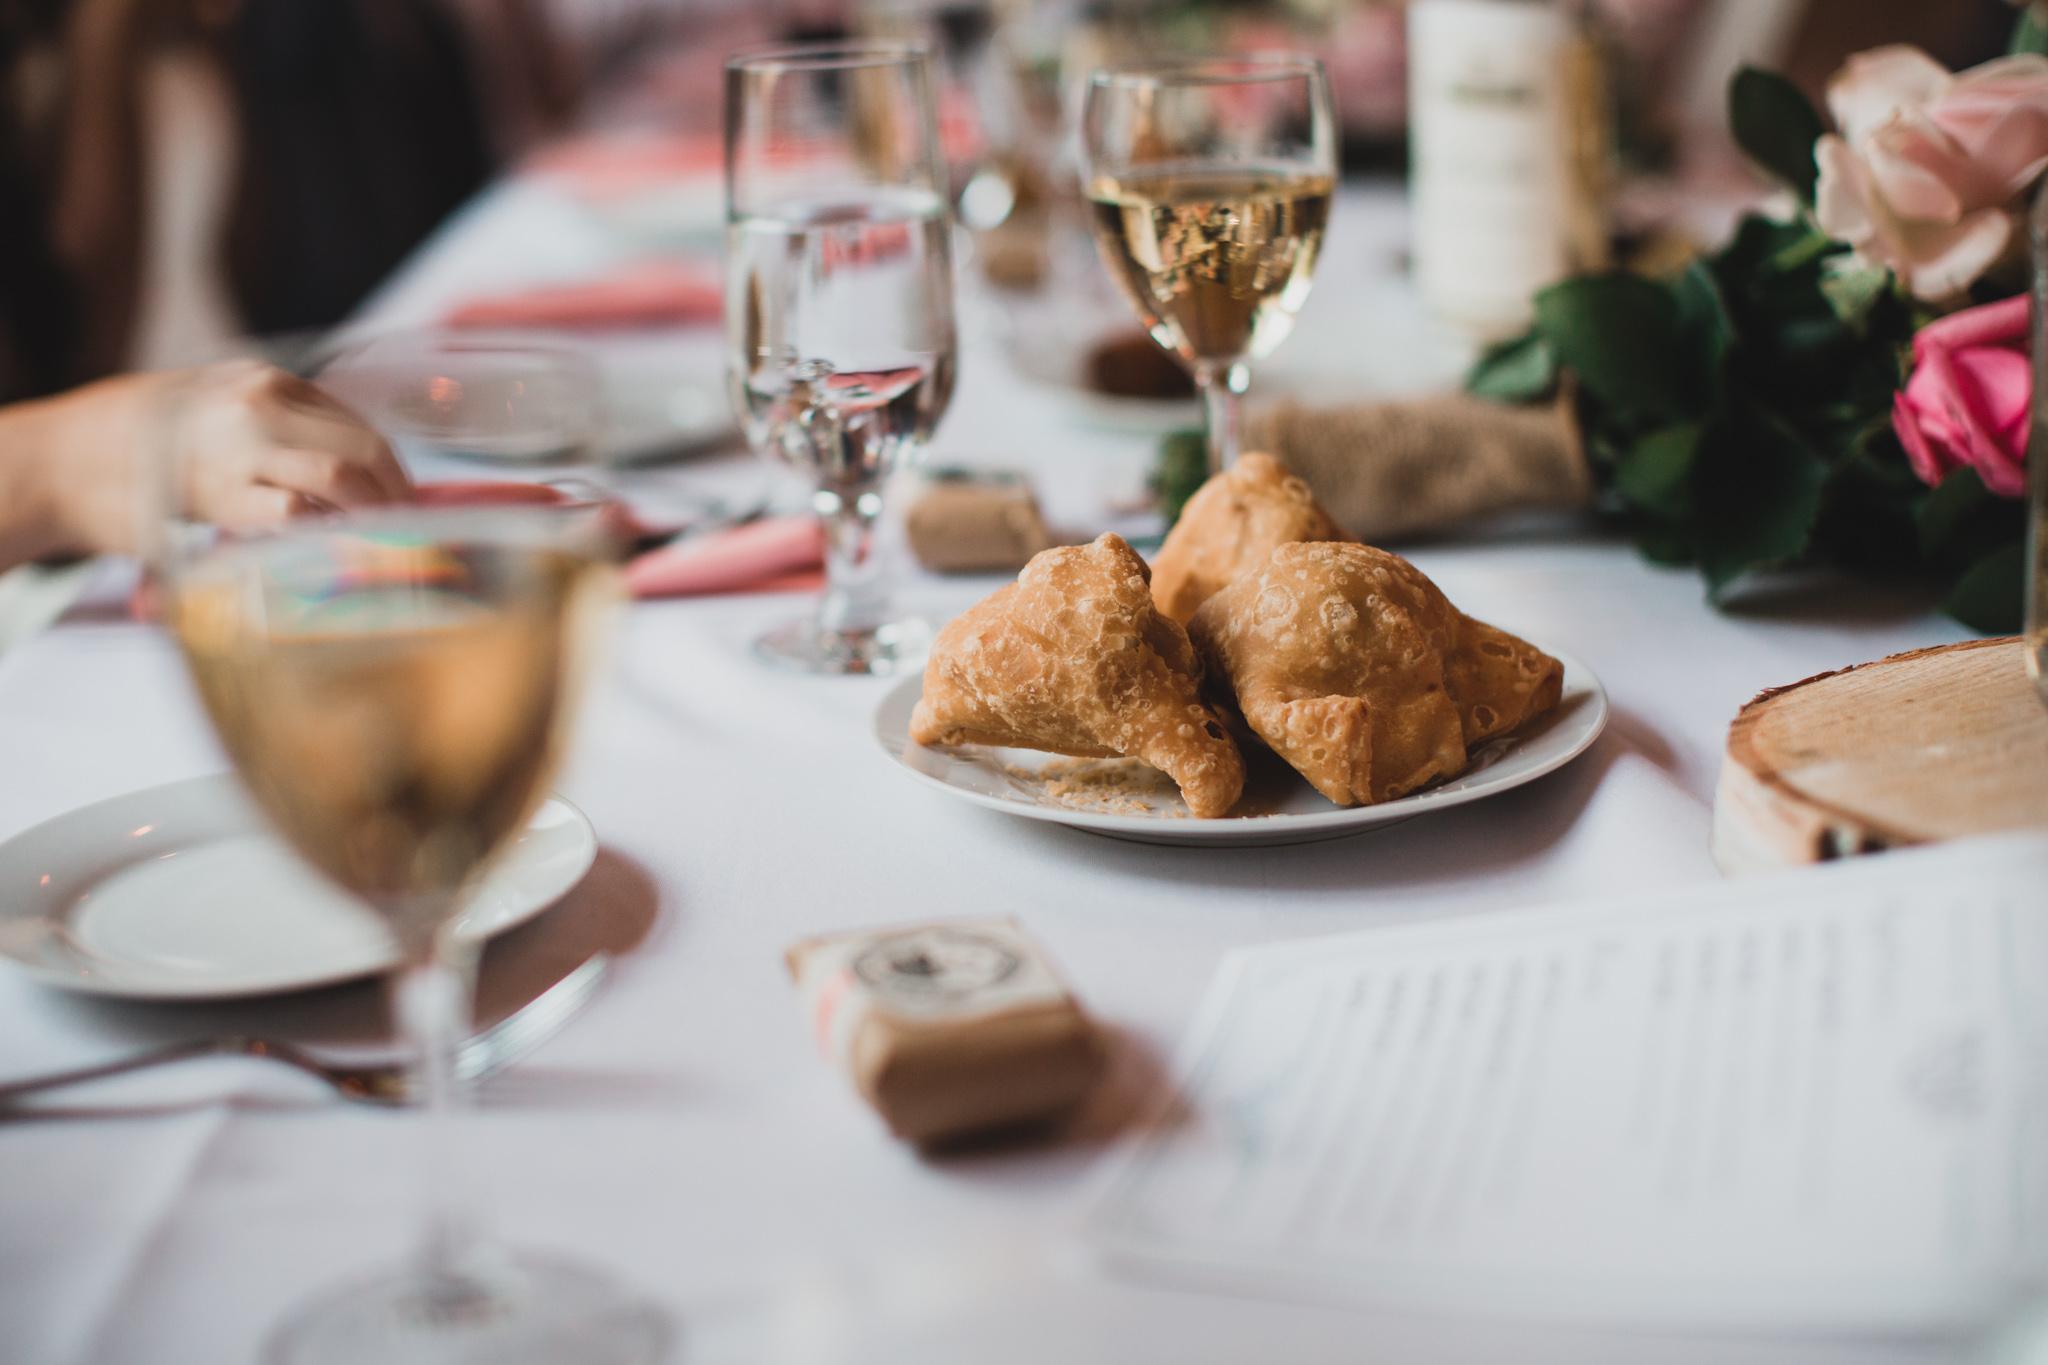 Sri Lankan catered wedding meal